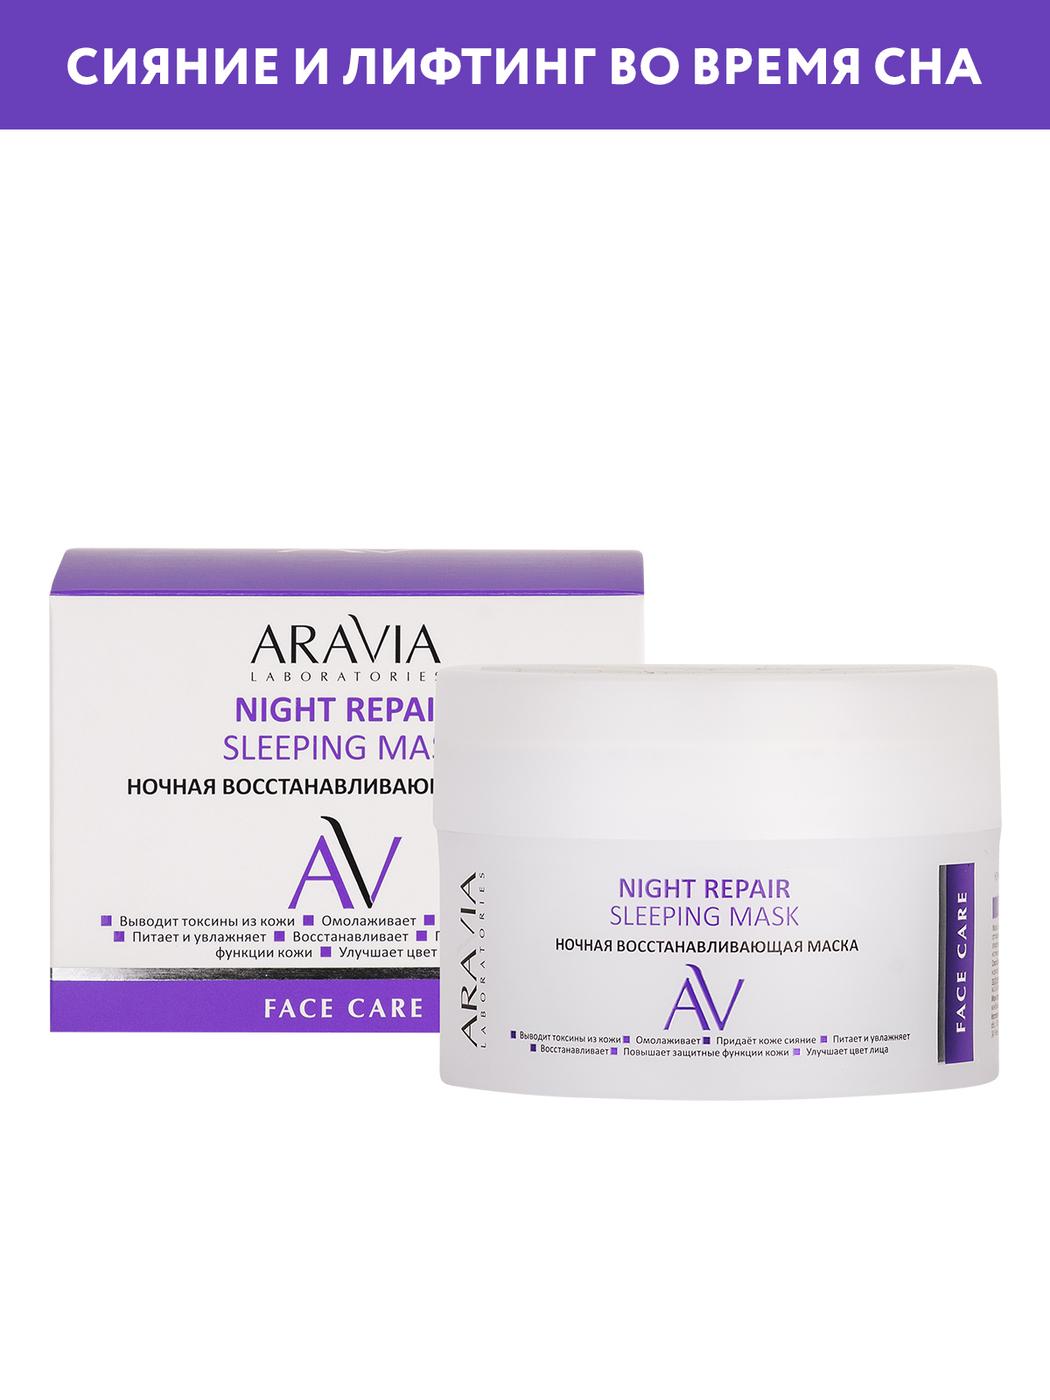 ARAVIA Laboratories Ночная восстанавливающая маска Night Repair Sleeping Mask, 150 мл